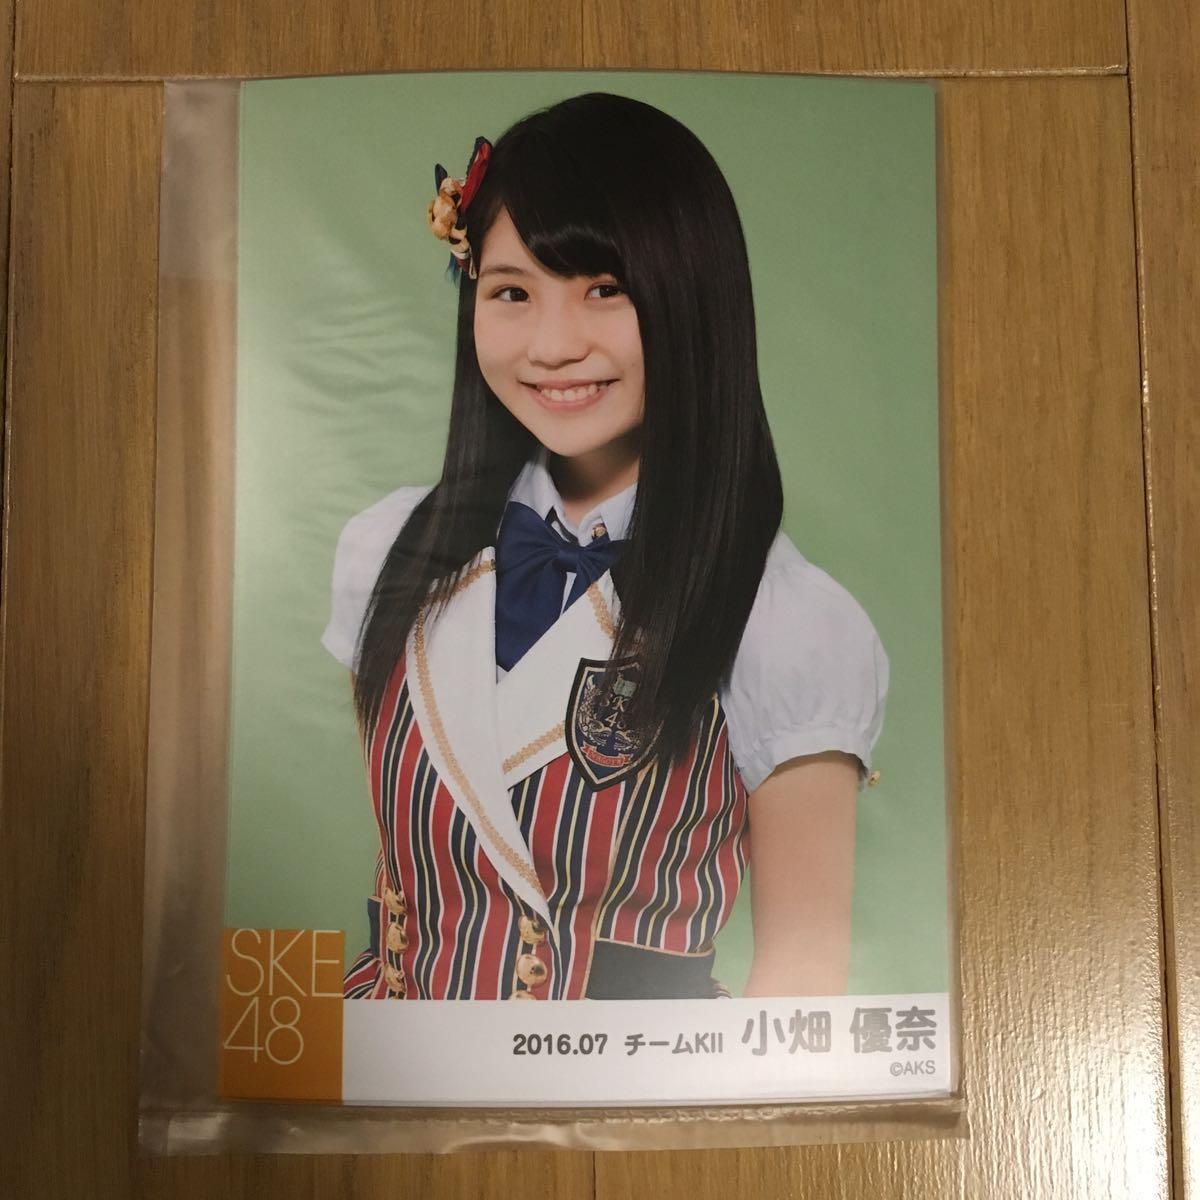 SKE48 小畑優奈 生写真 2016.7 5枚コンプ(未開封)